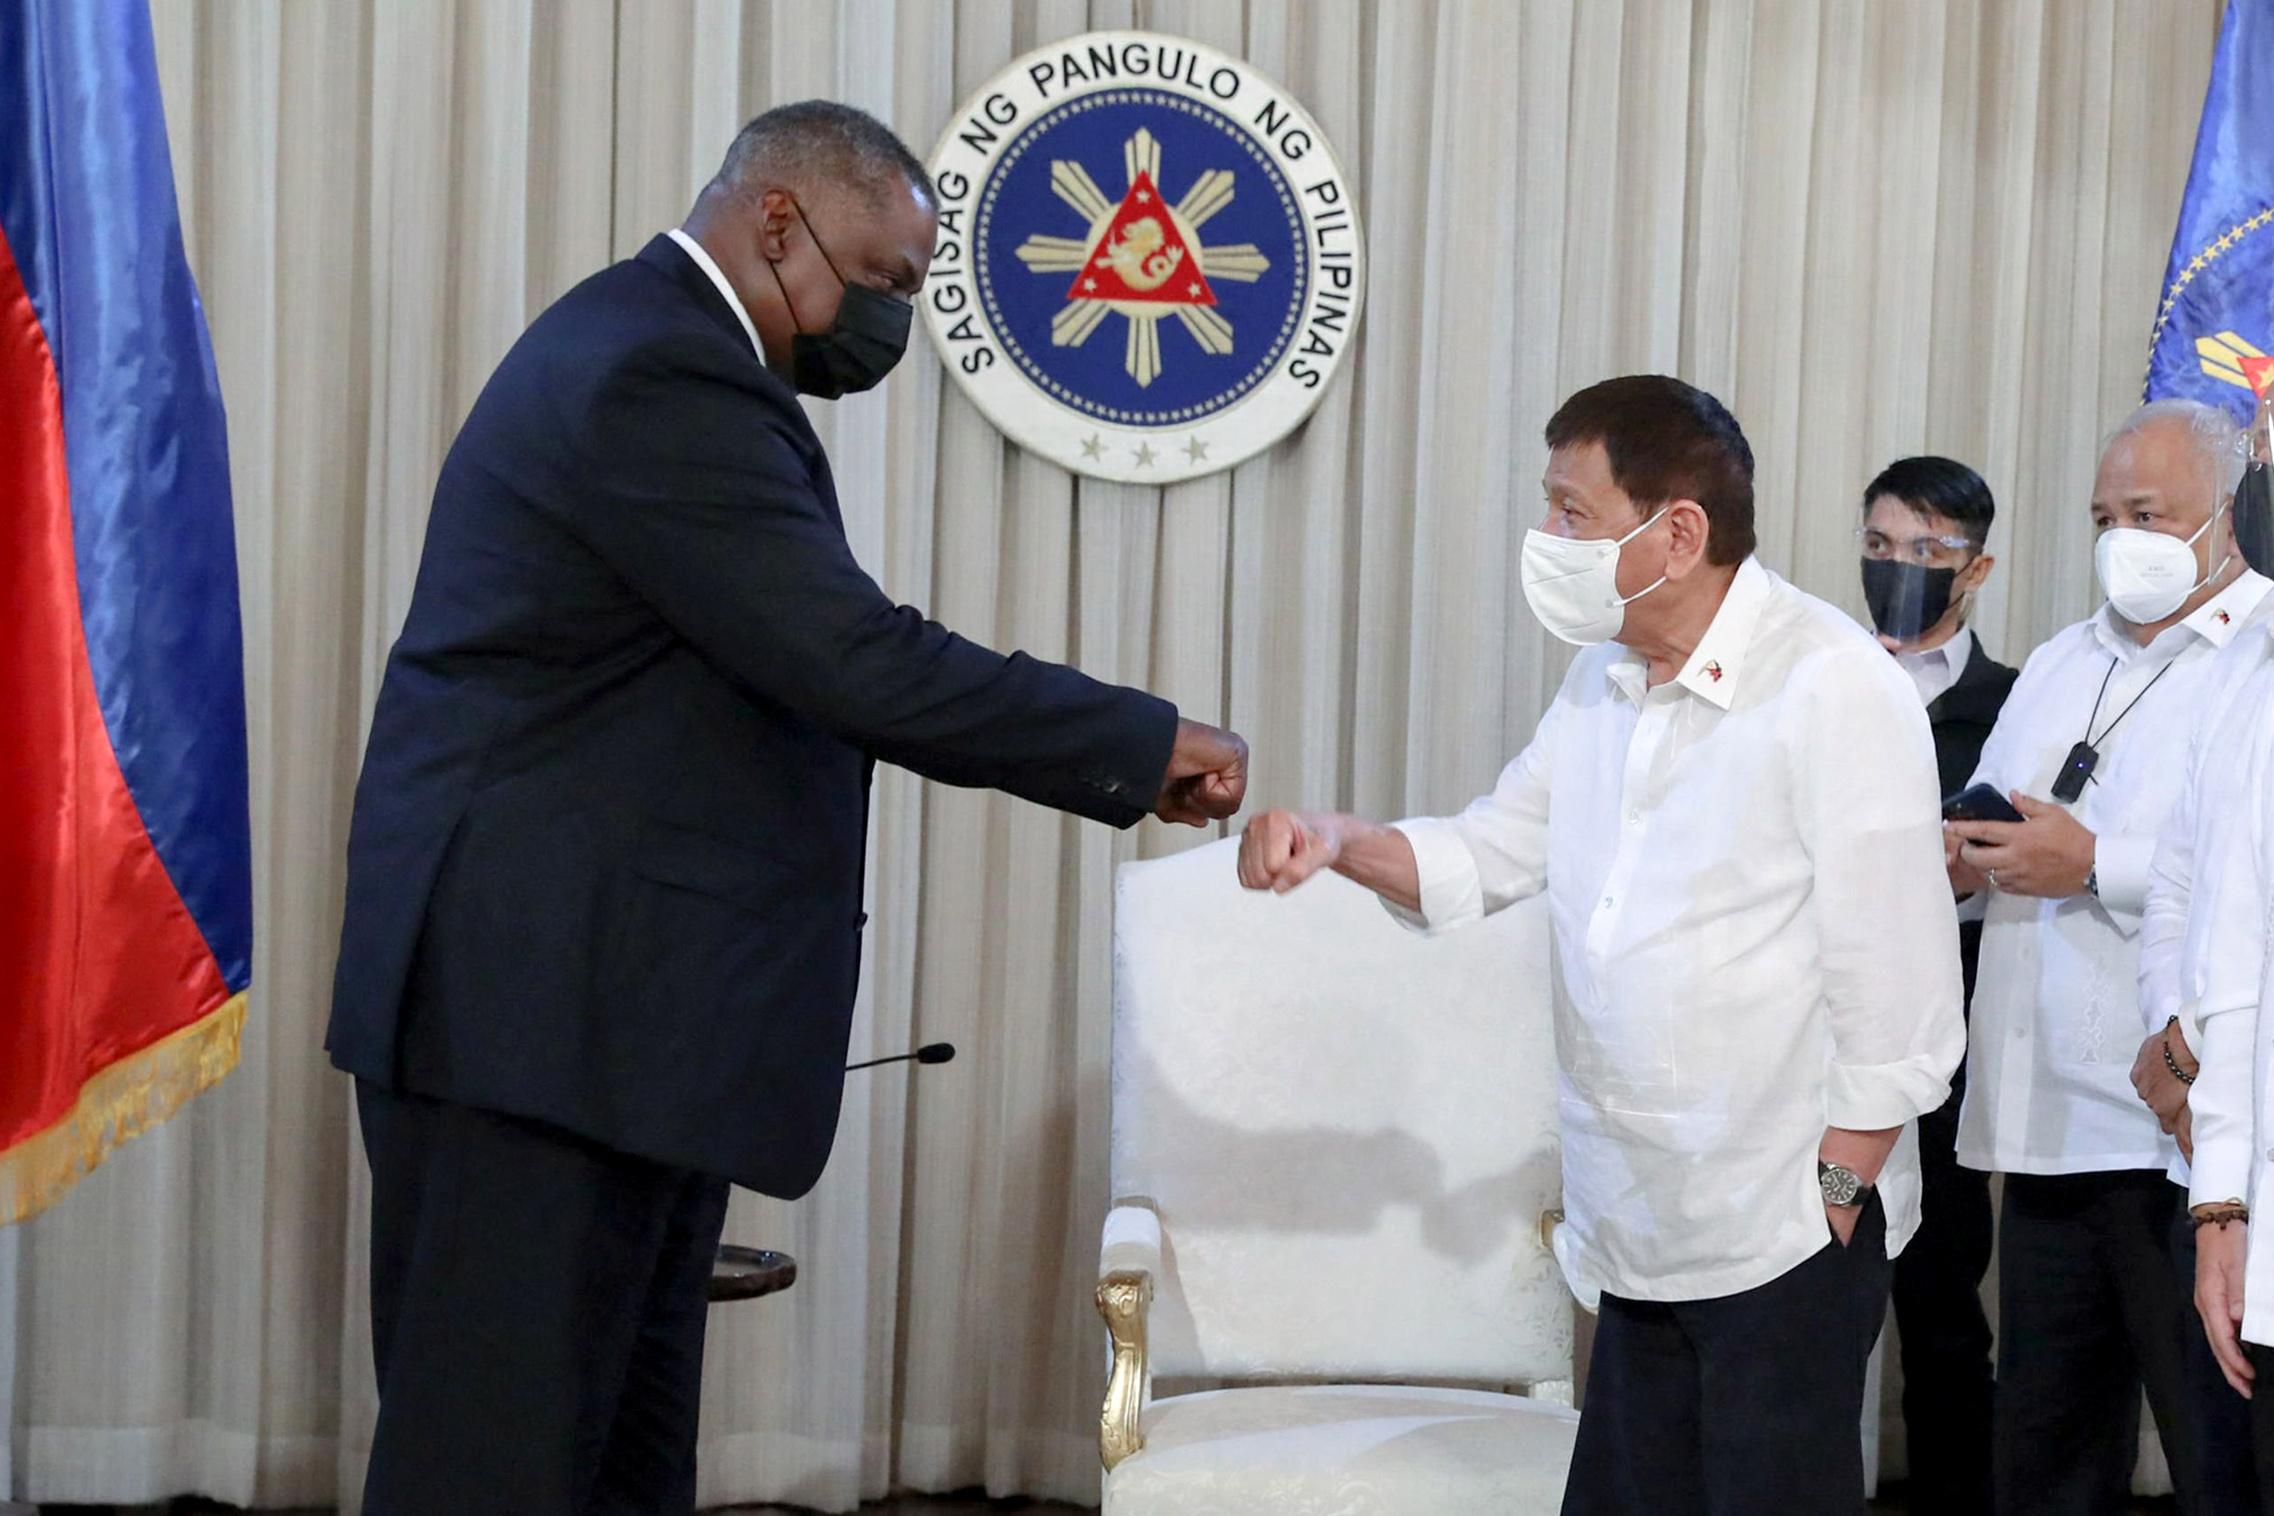 Philippine President fully restores key U.S. troop pact